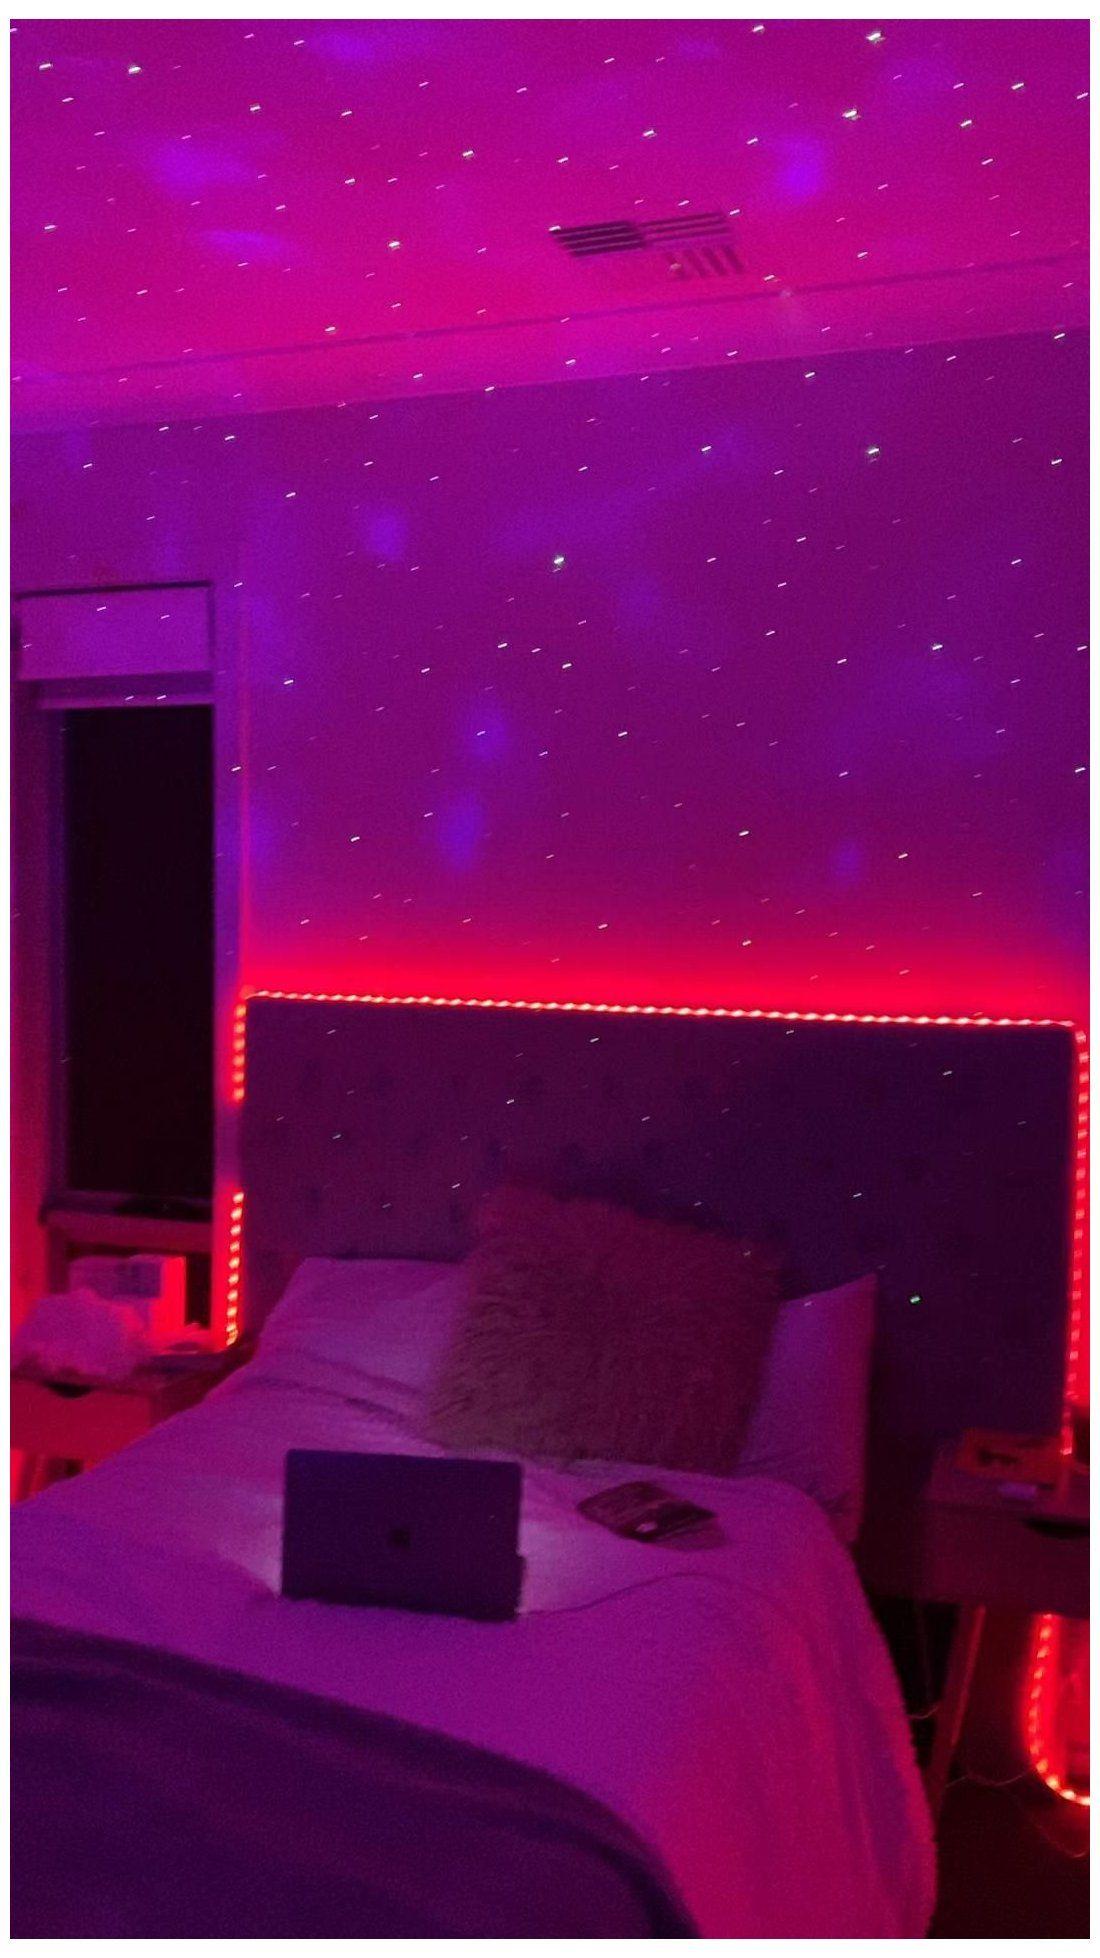 Room Ideas 2020 Cute Room Ideas For Teenagers With Led Lights Cuteroomideasforteenagerswithledli Bedroom Makeover Room Inspiration Bedroom Dreamy Room